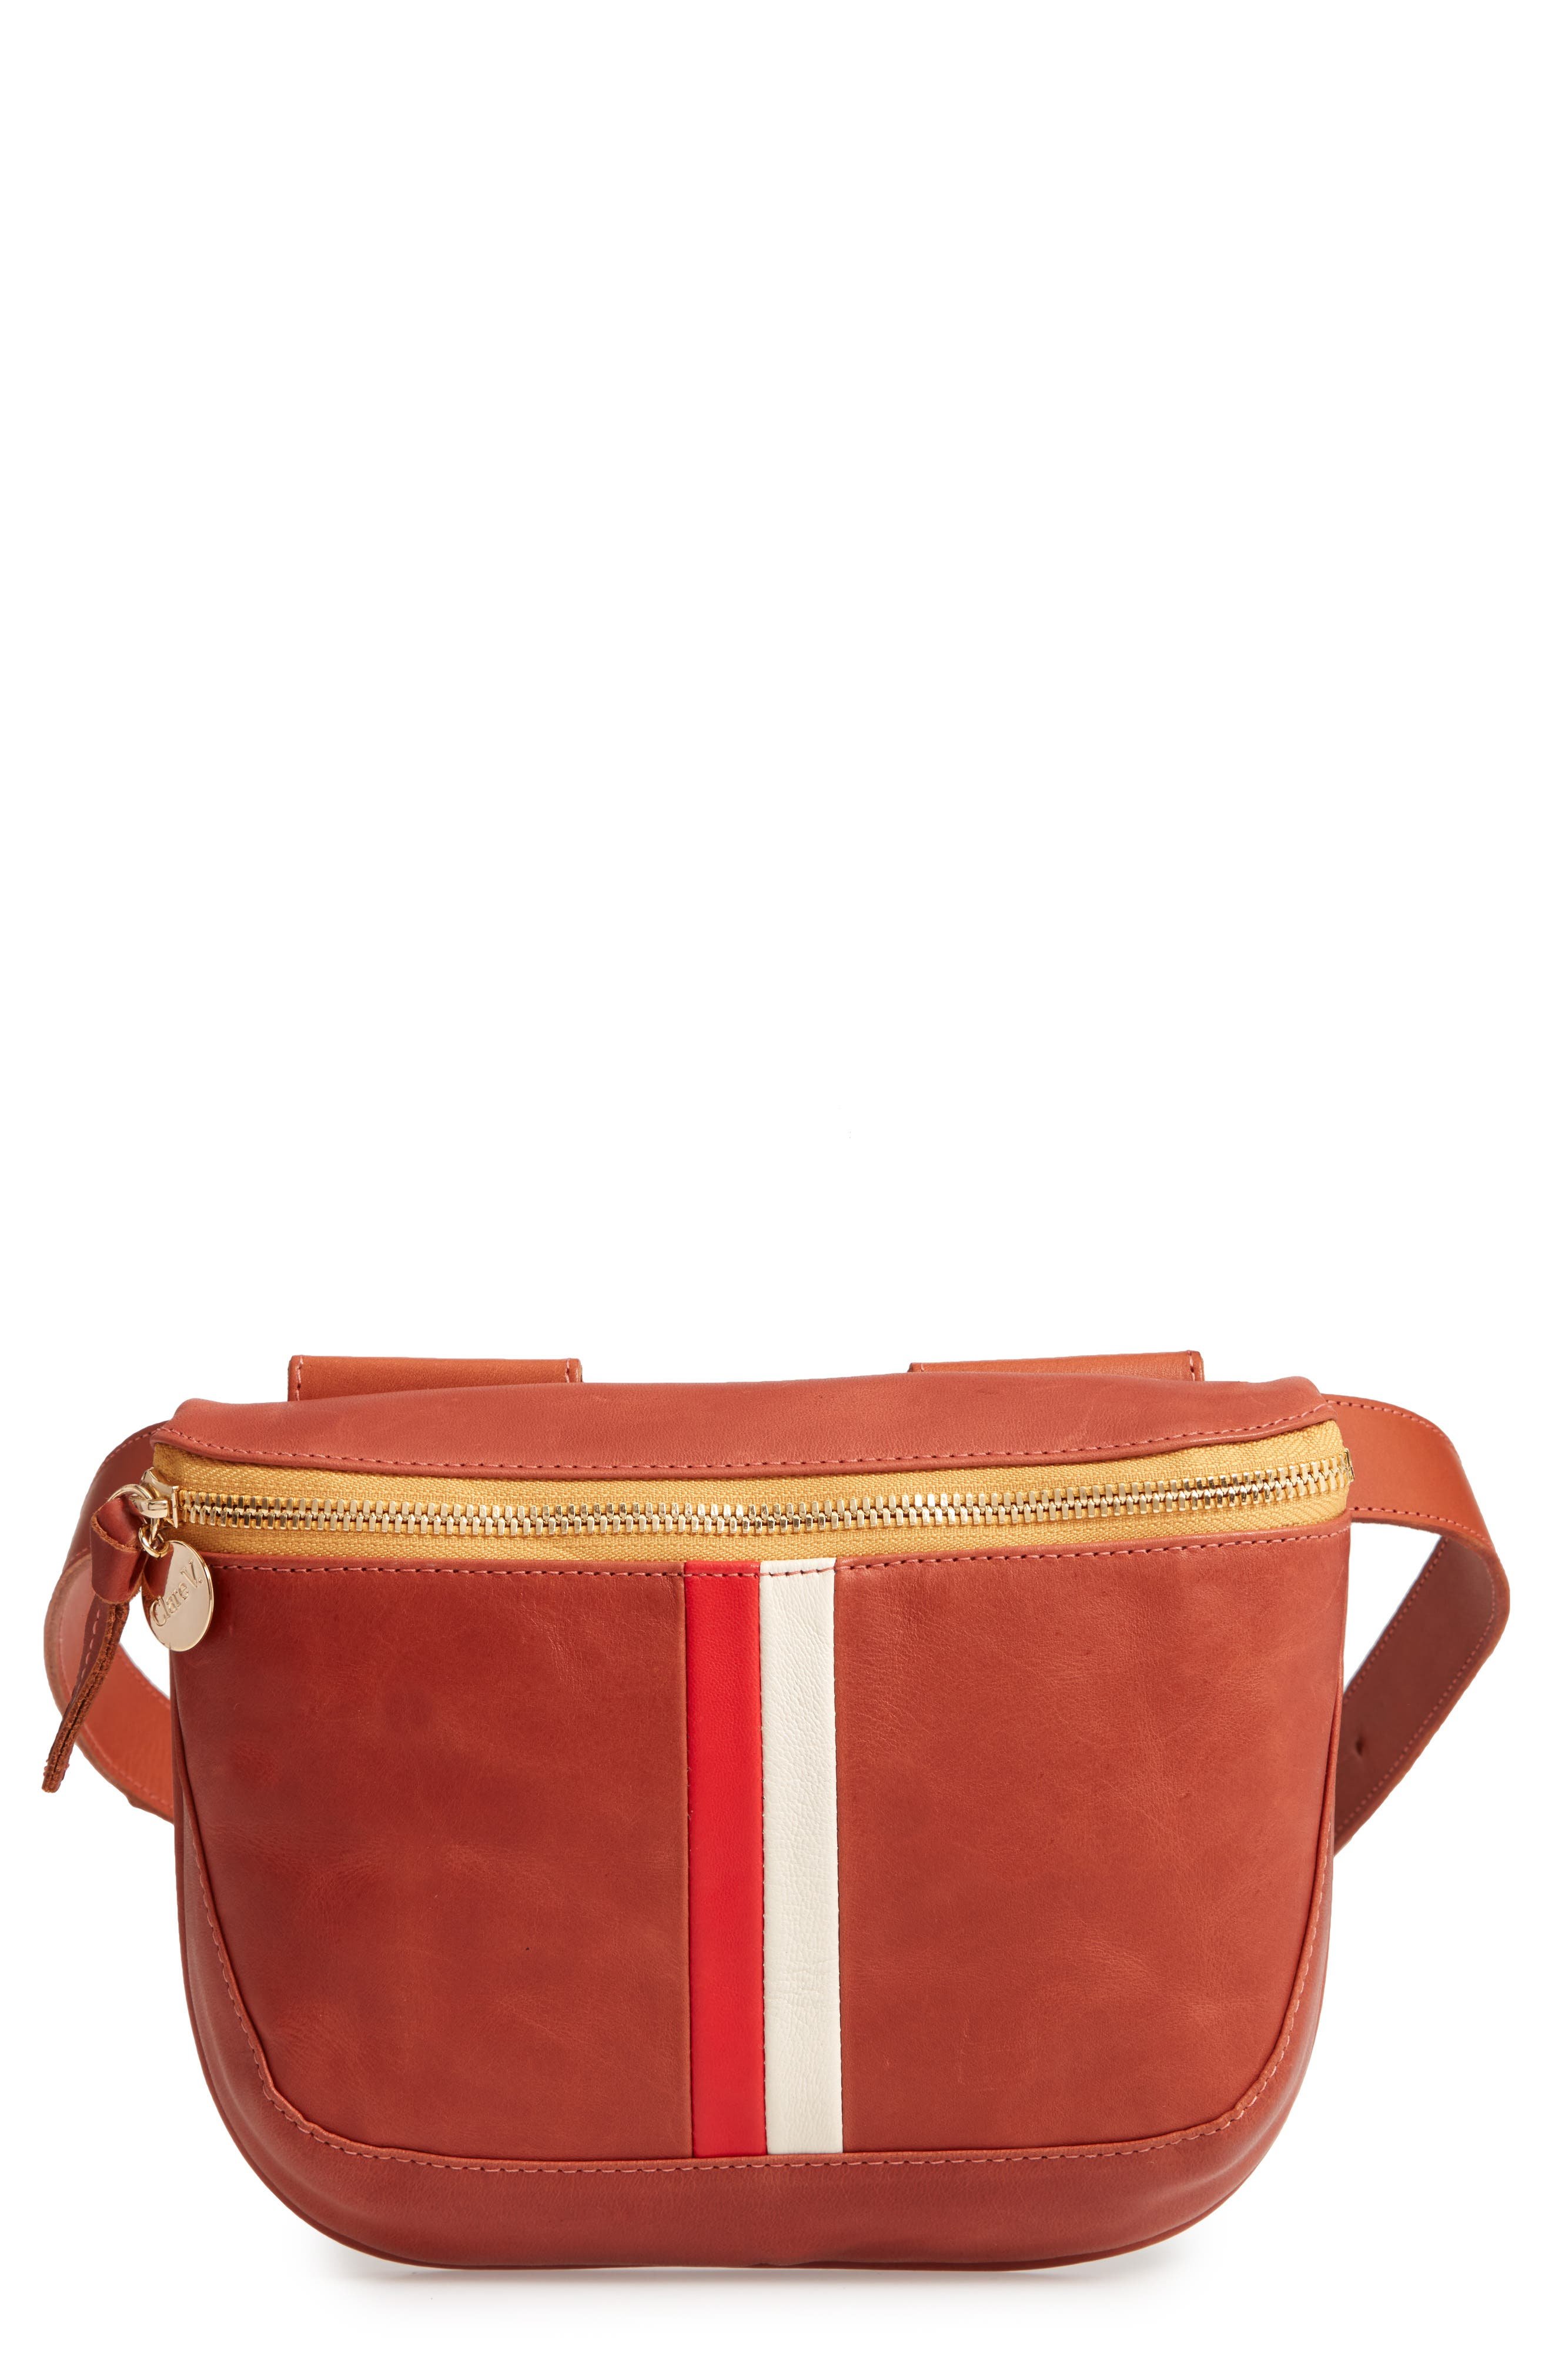 CLARE V Leather Fanny Pack - Brown in Cognac Veg Stripe